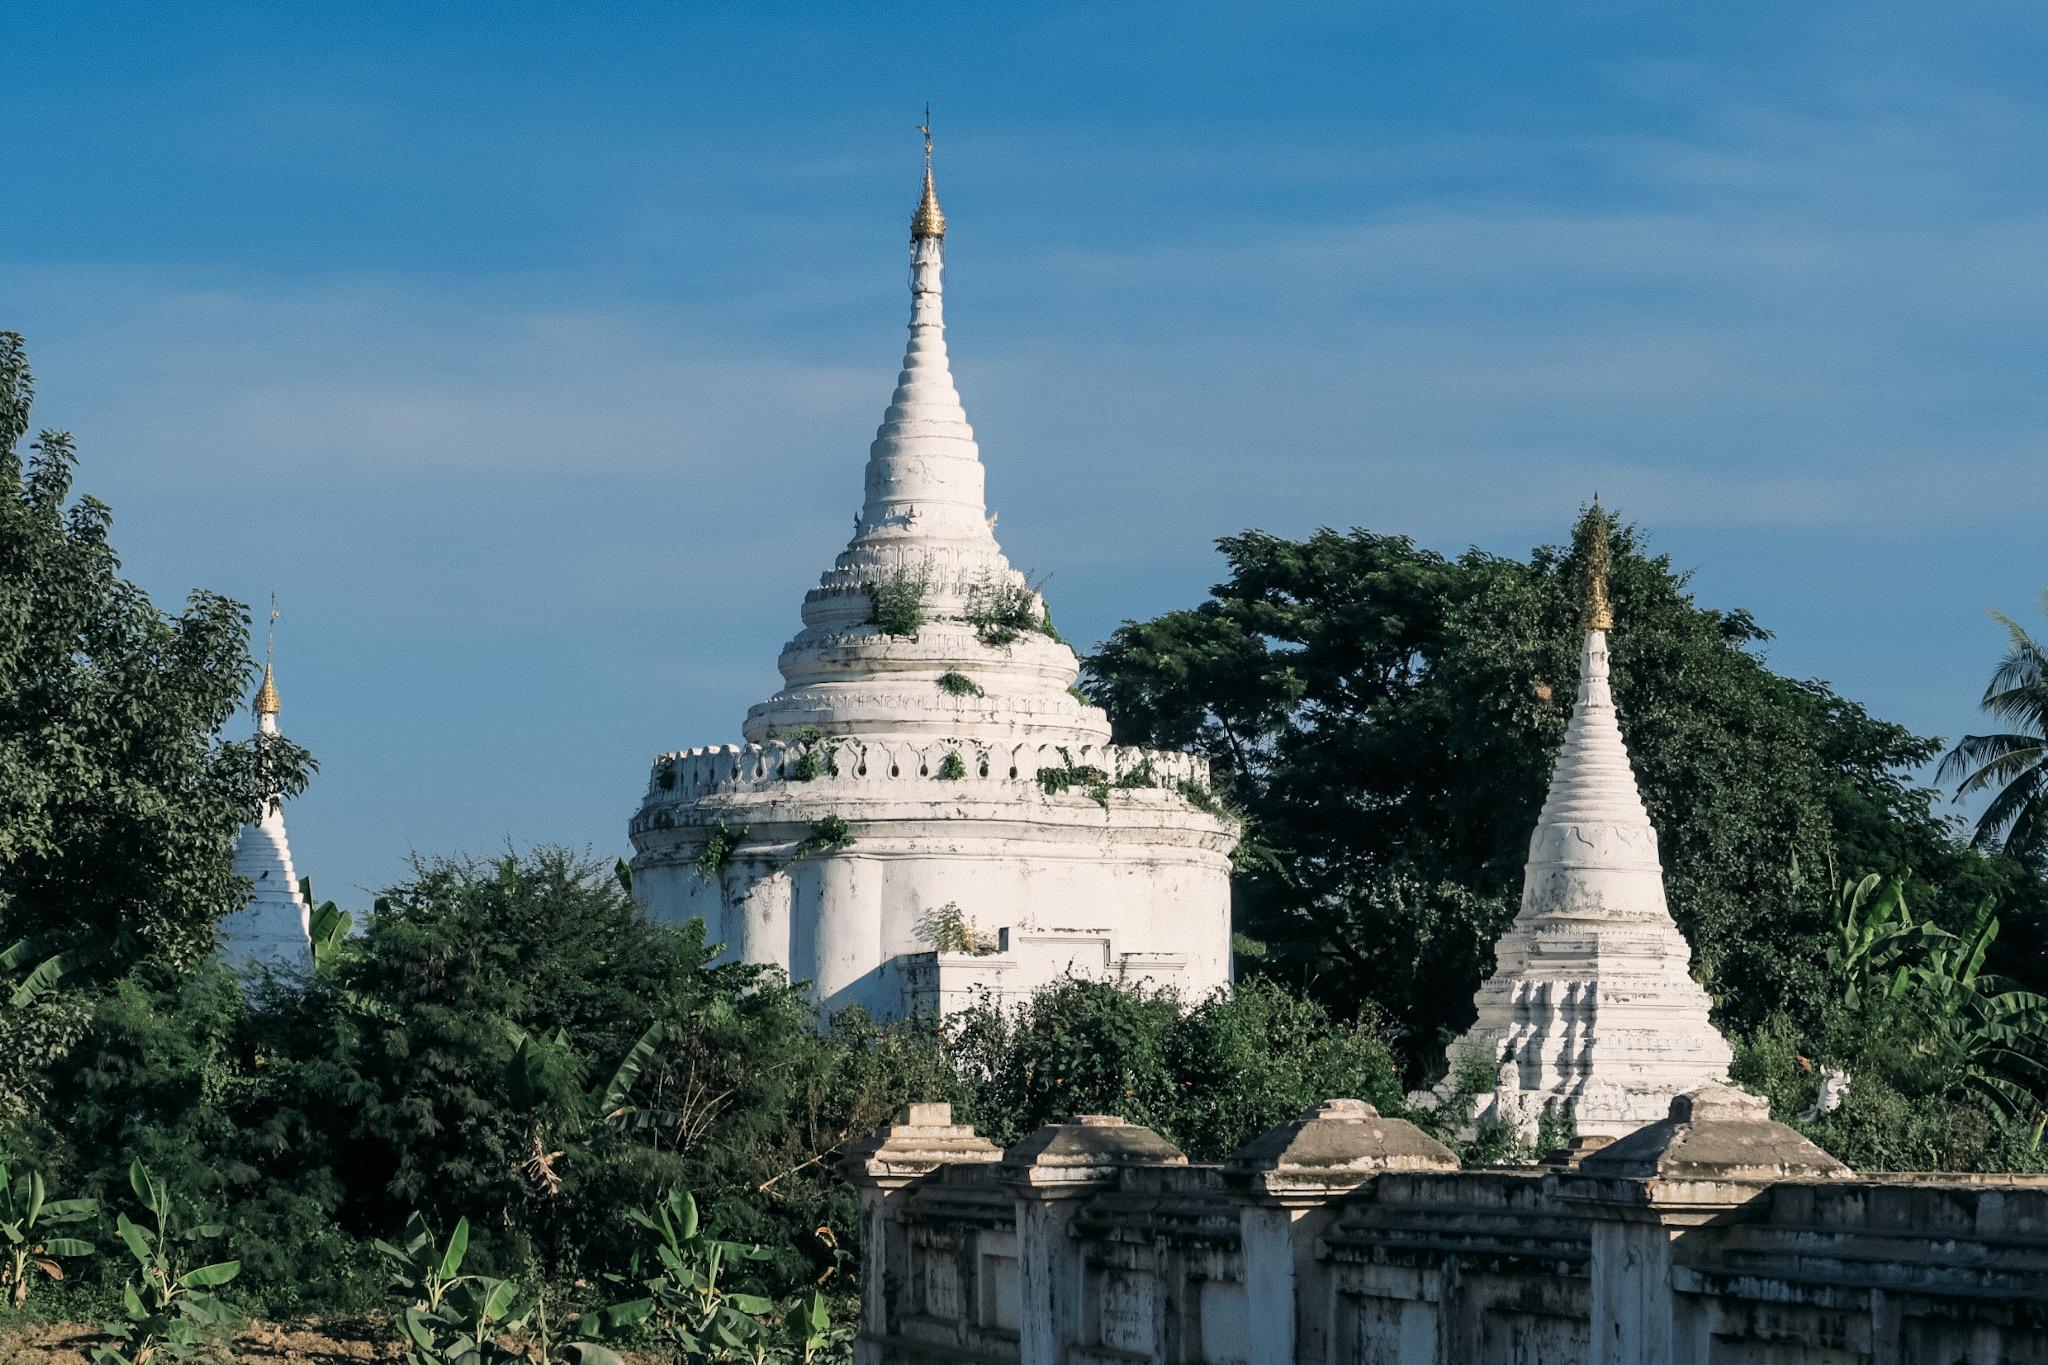 White Pagoda with no name